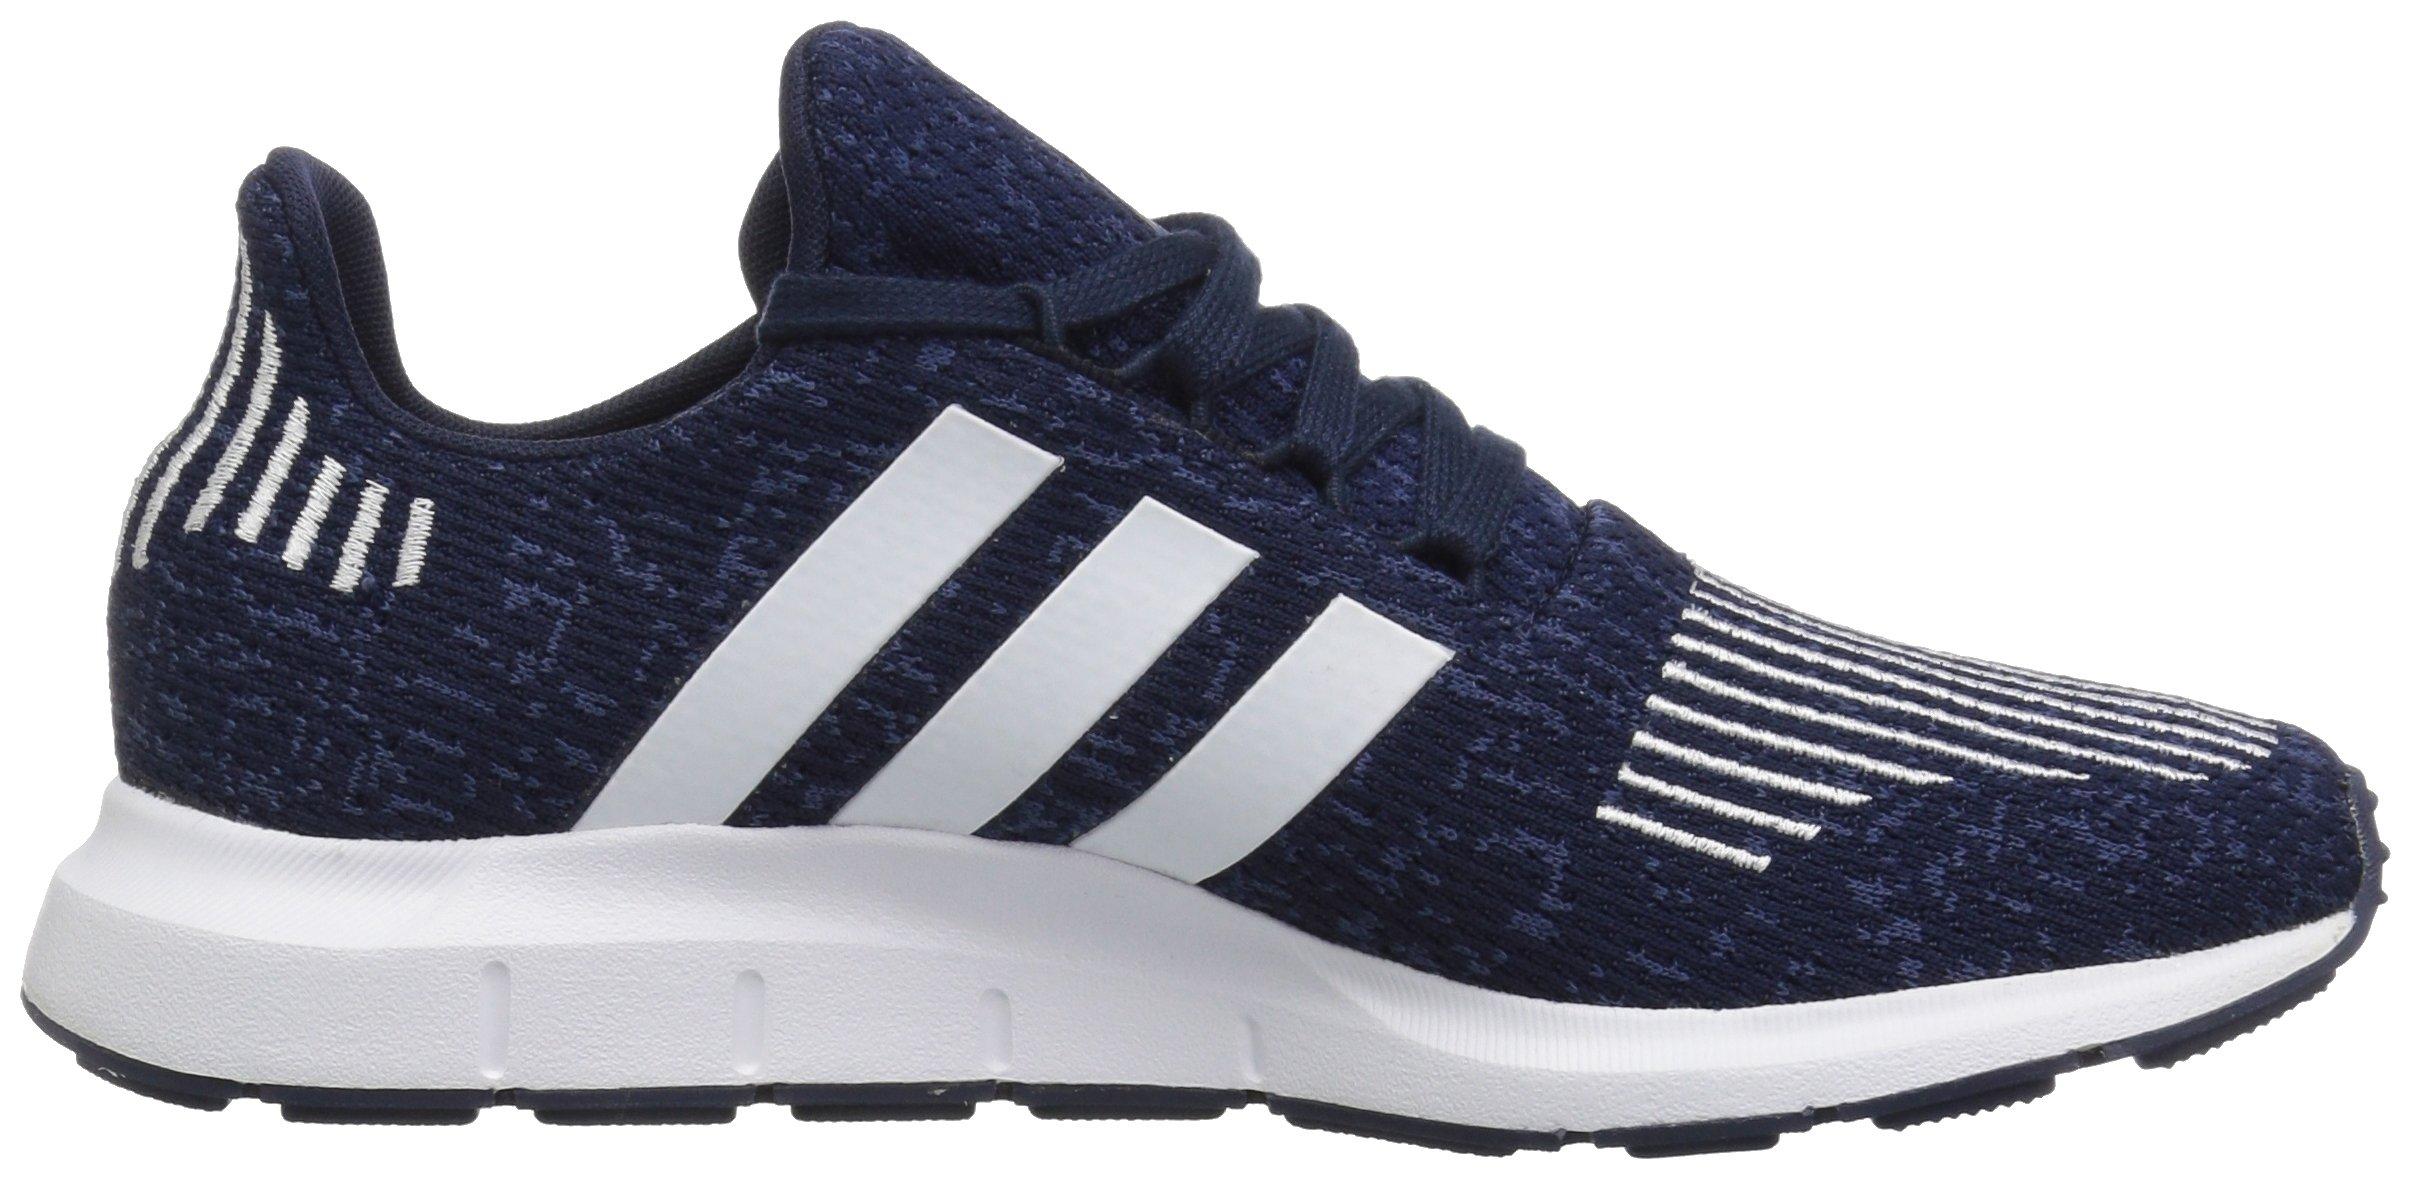 adidas Originals Baby Swift Running Shoe, Collegiate Navy/White/Mystery Blue, 4K M US Toddler by adidas Originals (Image #6)